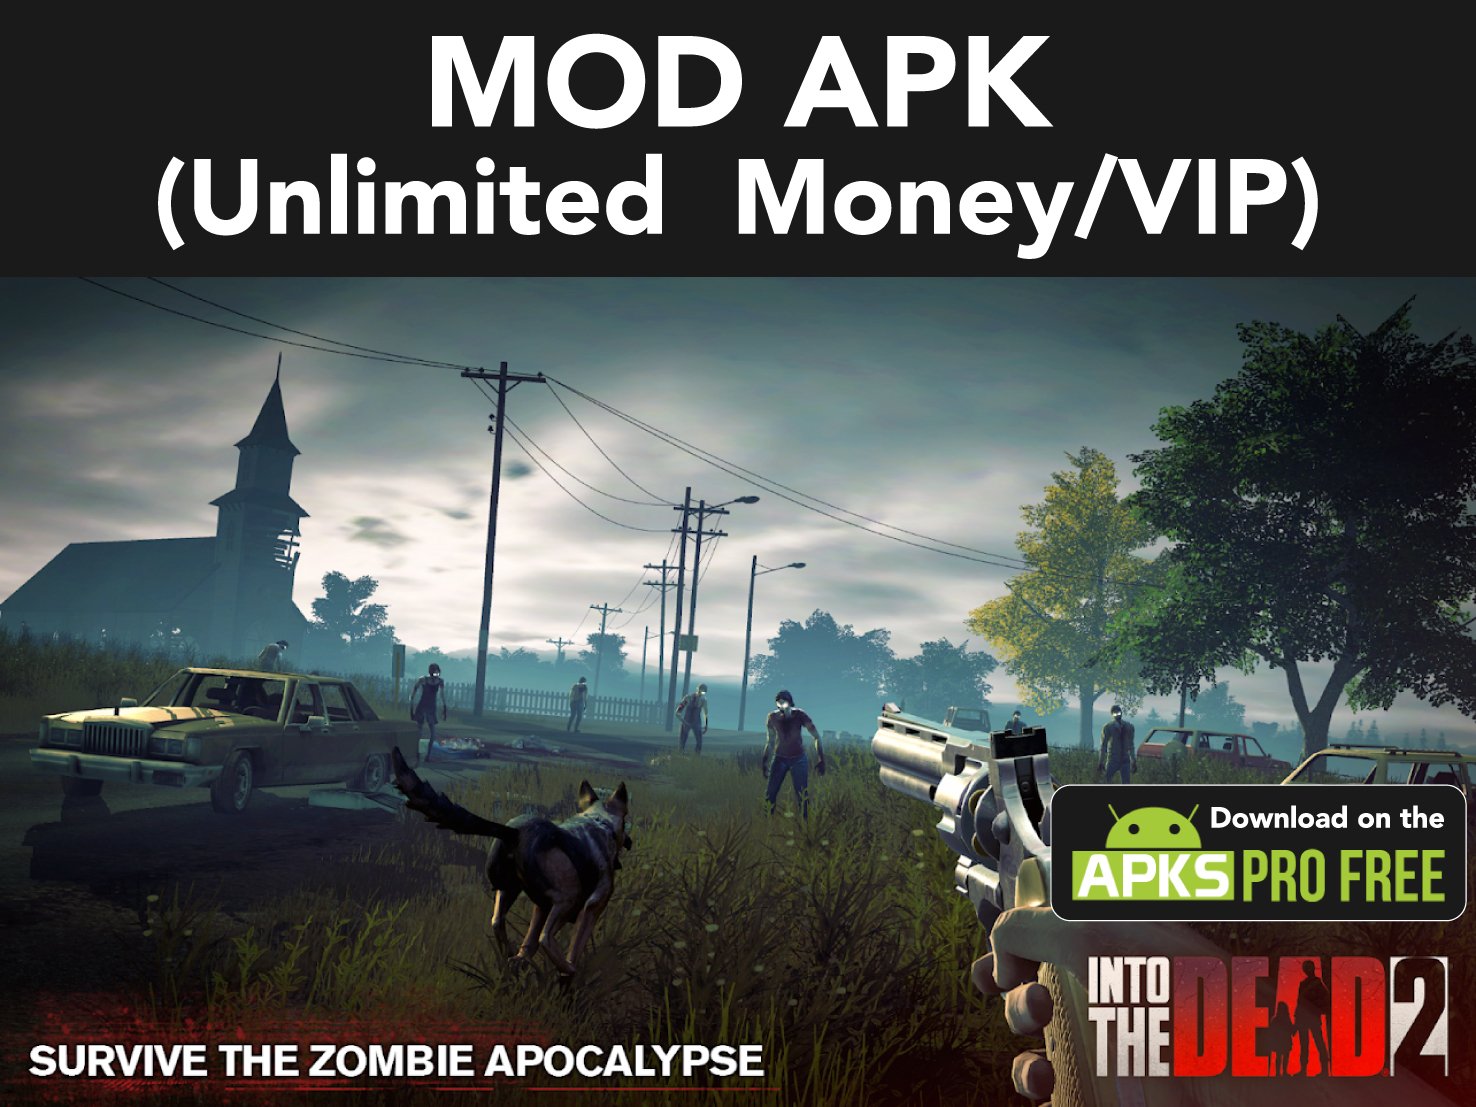 Into The Dead 2 Mod APK+OBB File (Unlimited Money/VIP)